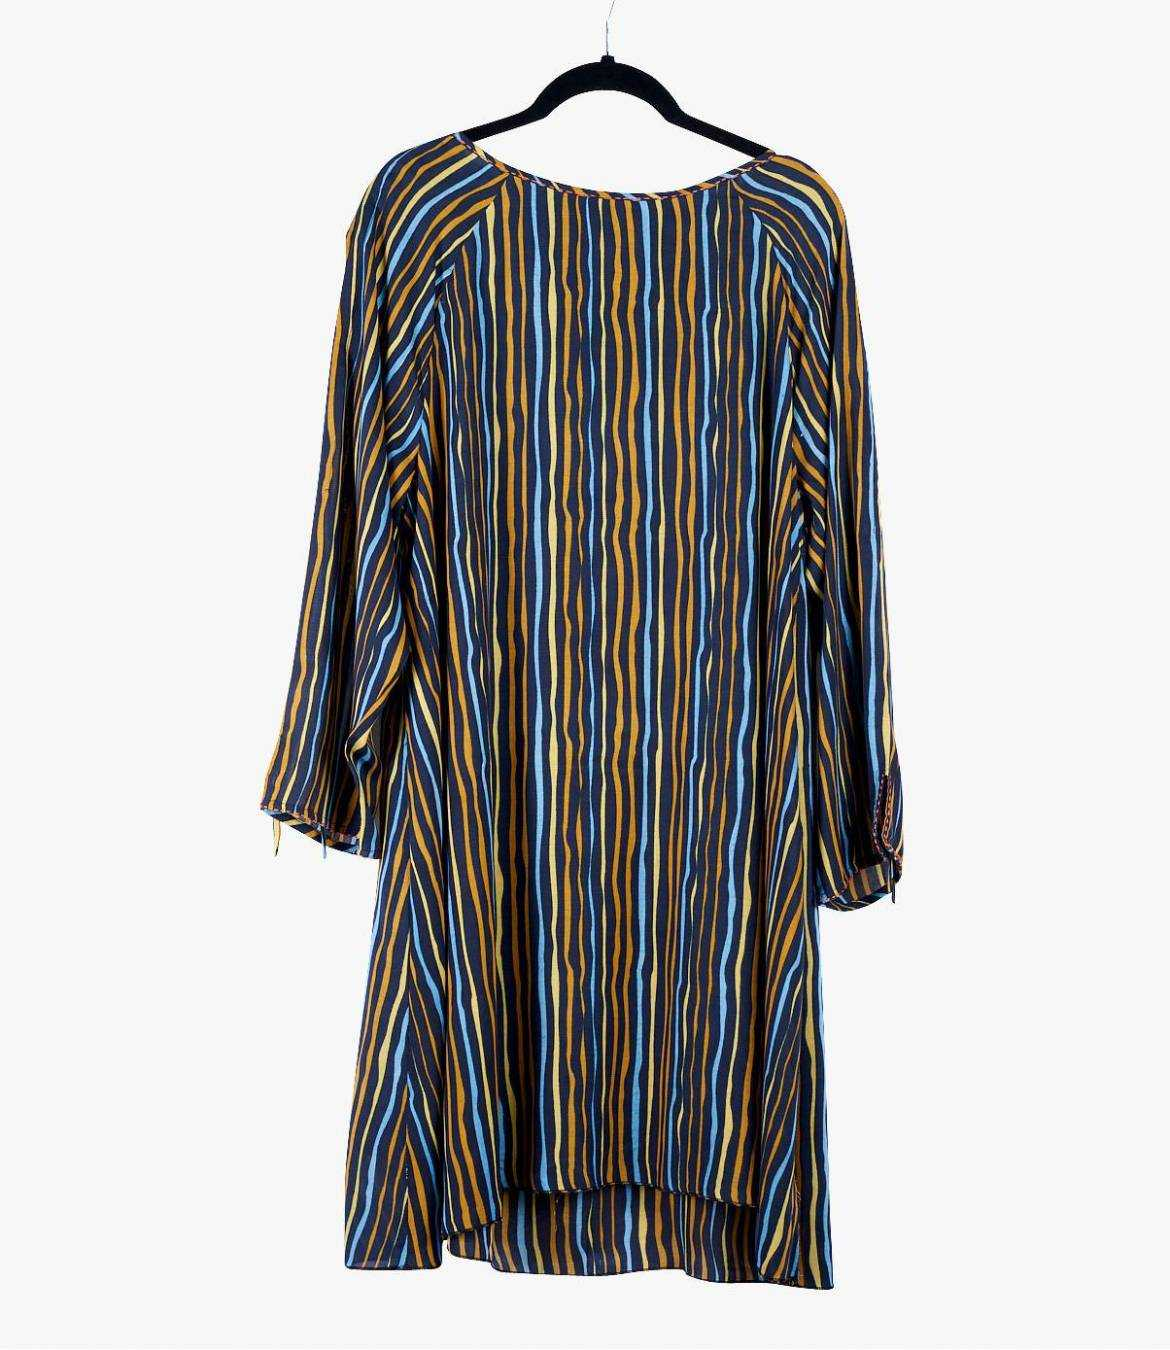 LARA NOVA Women's Modal Dress Storiatipic - 1